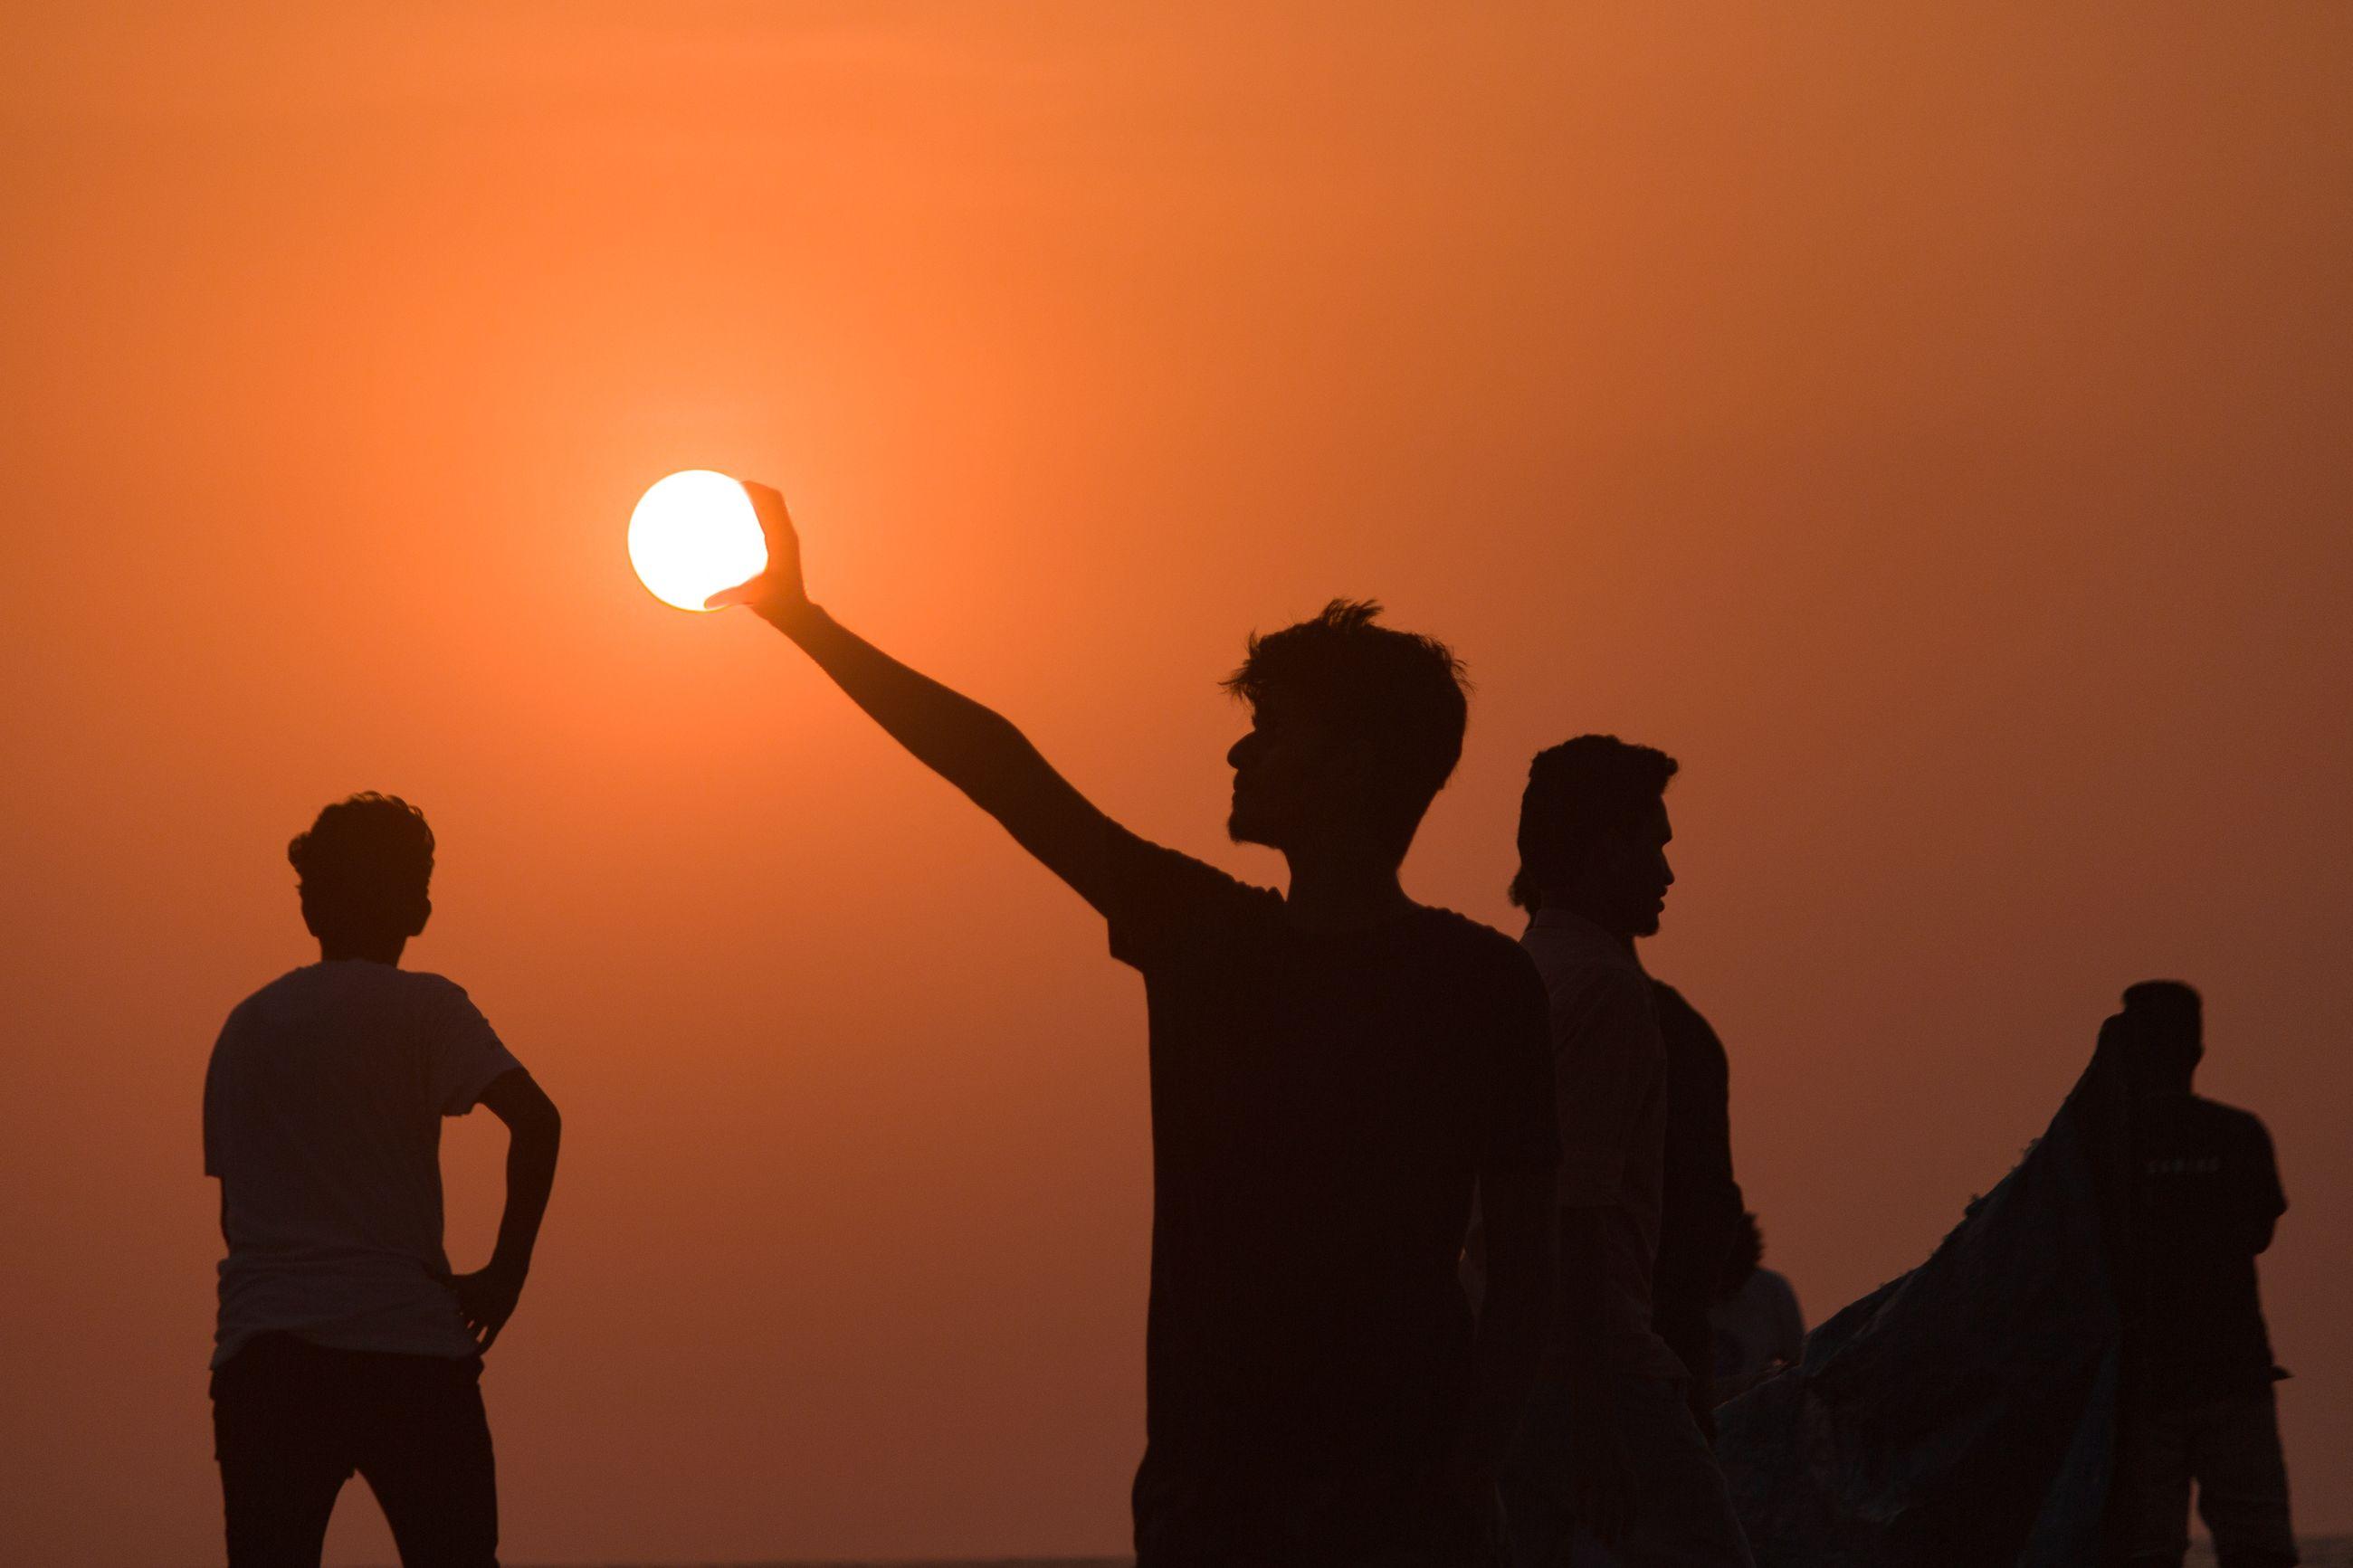 SILHOUETTE FRIENDS STANDING AGAINST ORANGE SKY